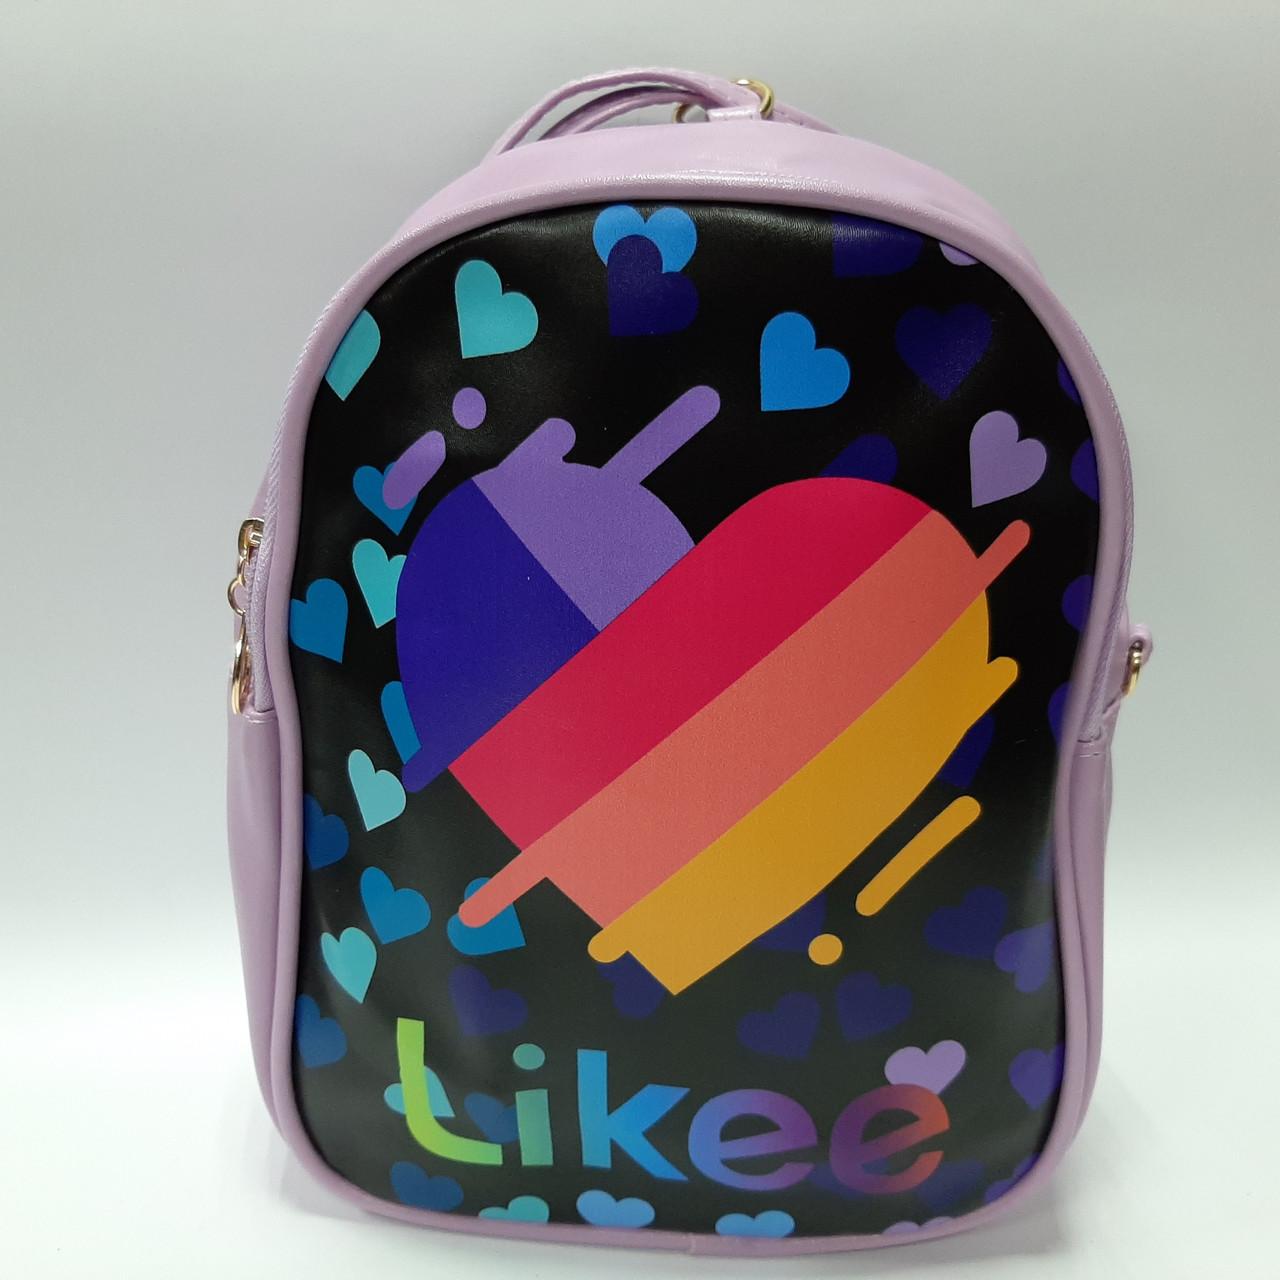 Рюкзак для девочки Likee